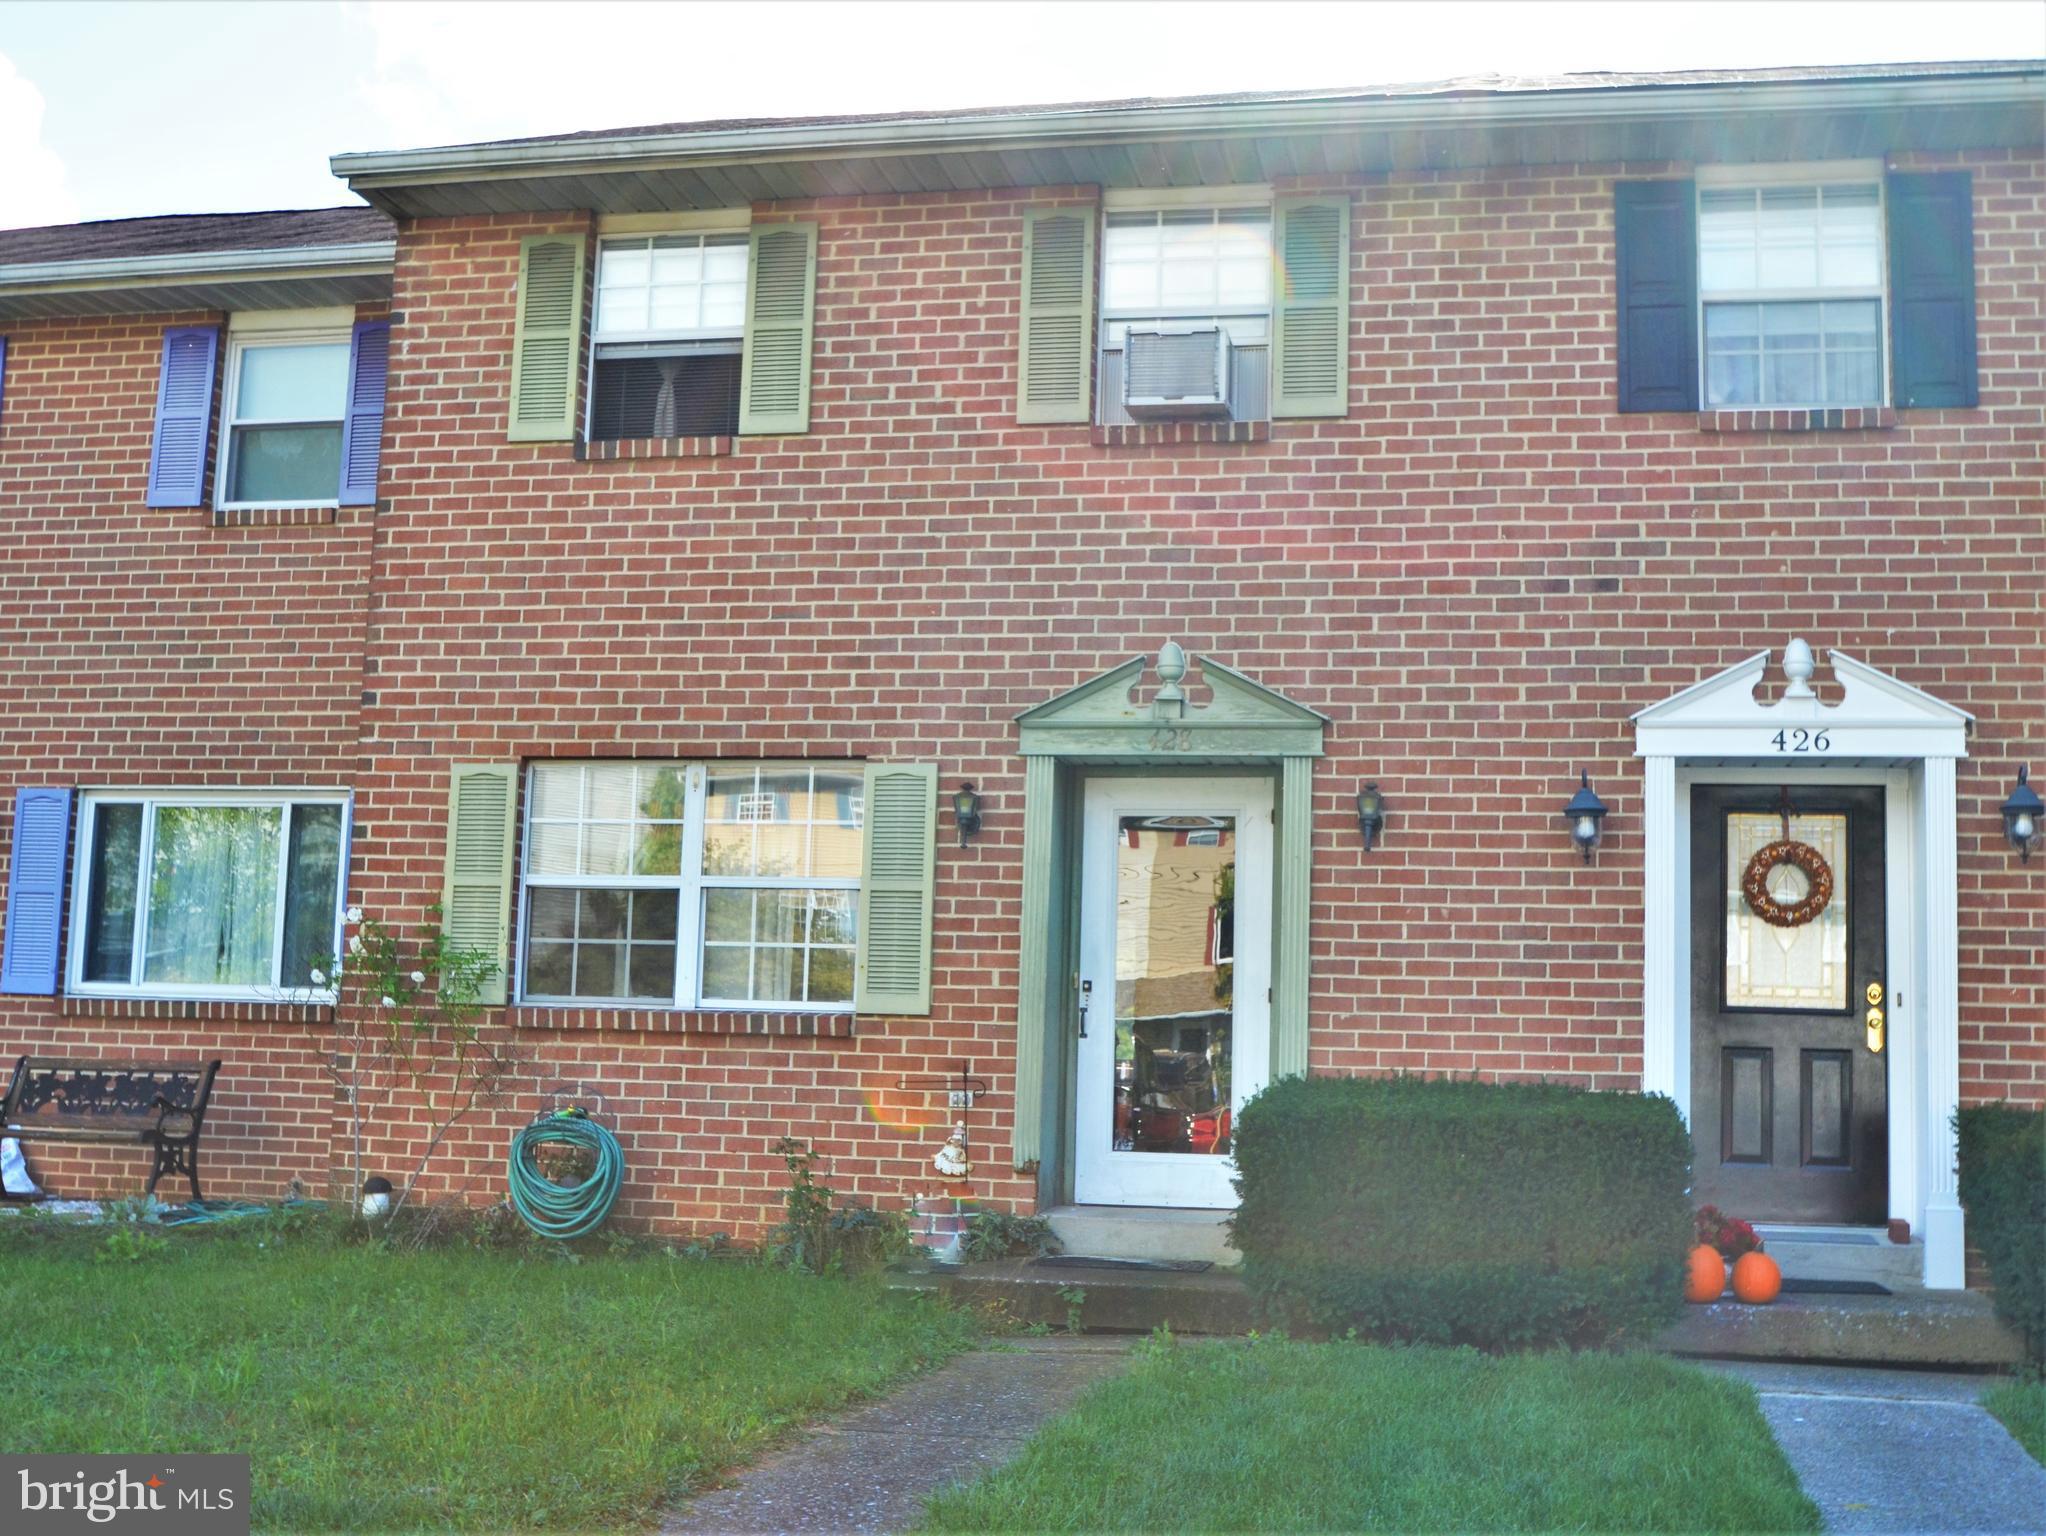 428 E MOSSER STREET, ALLENTOWN, PA 18109